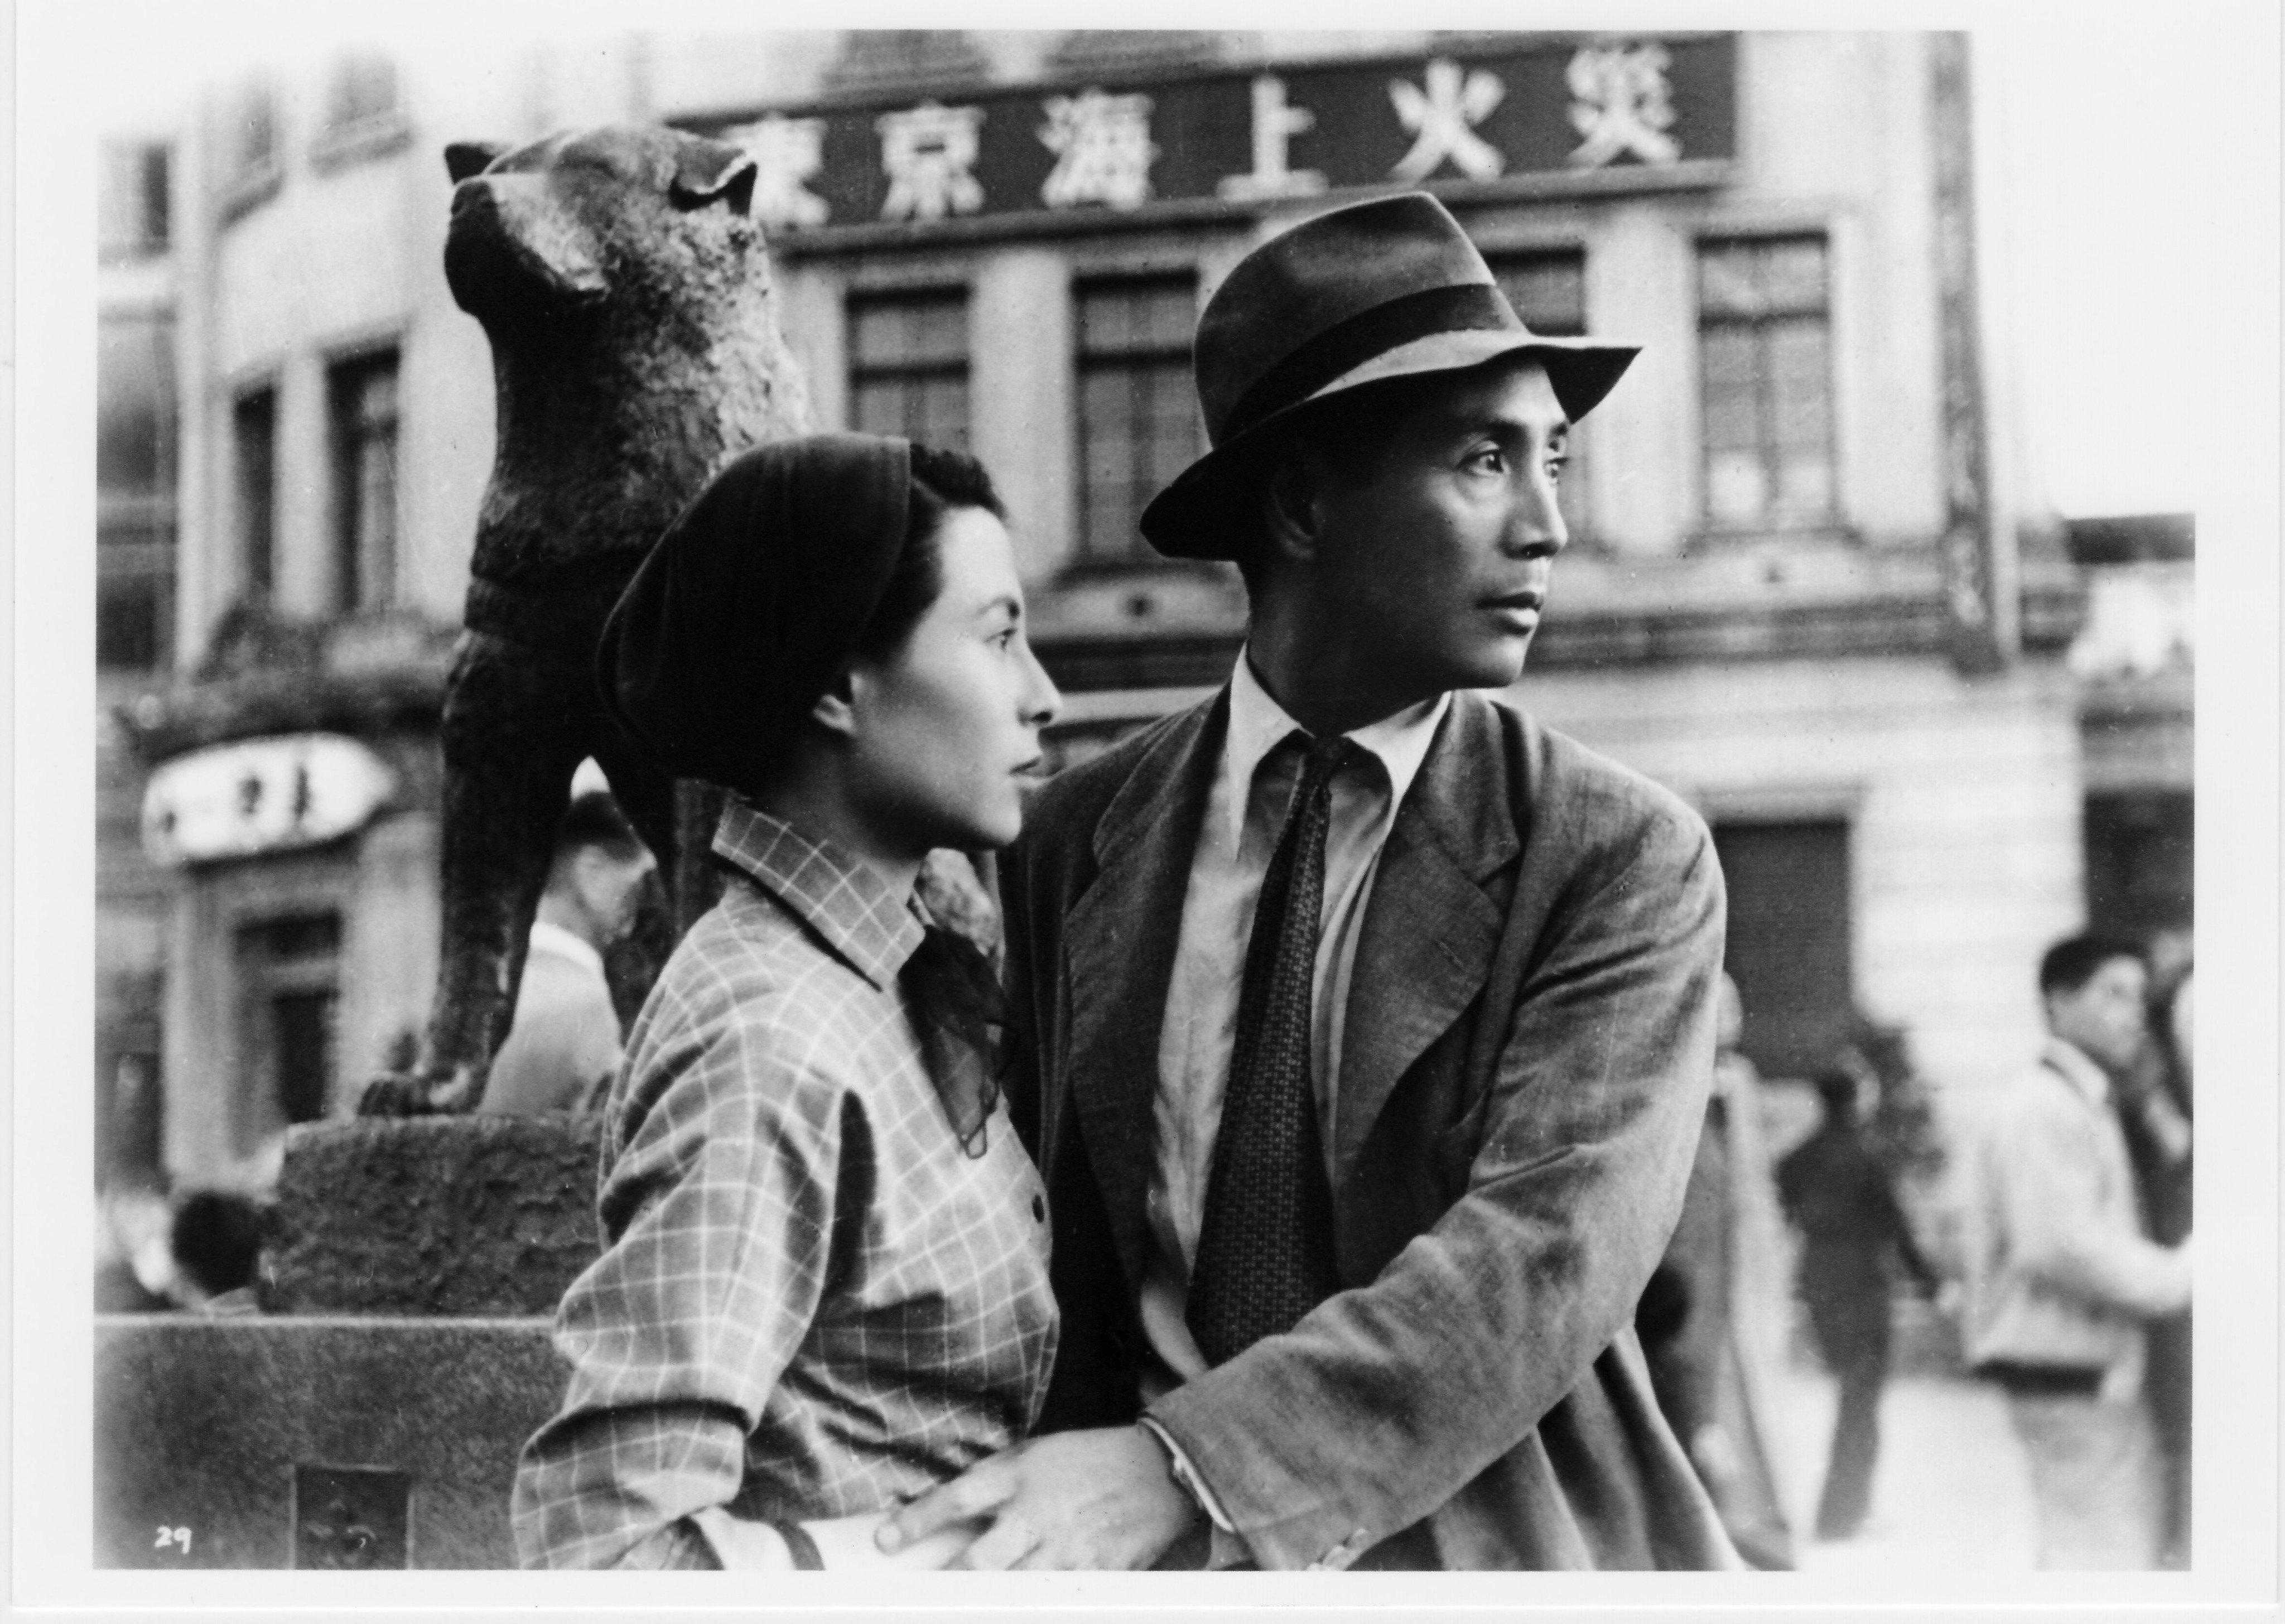 Yoshiko Kuga and Masayuki Mori in Koibumi (1953)